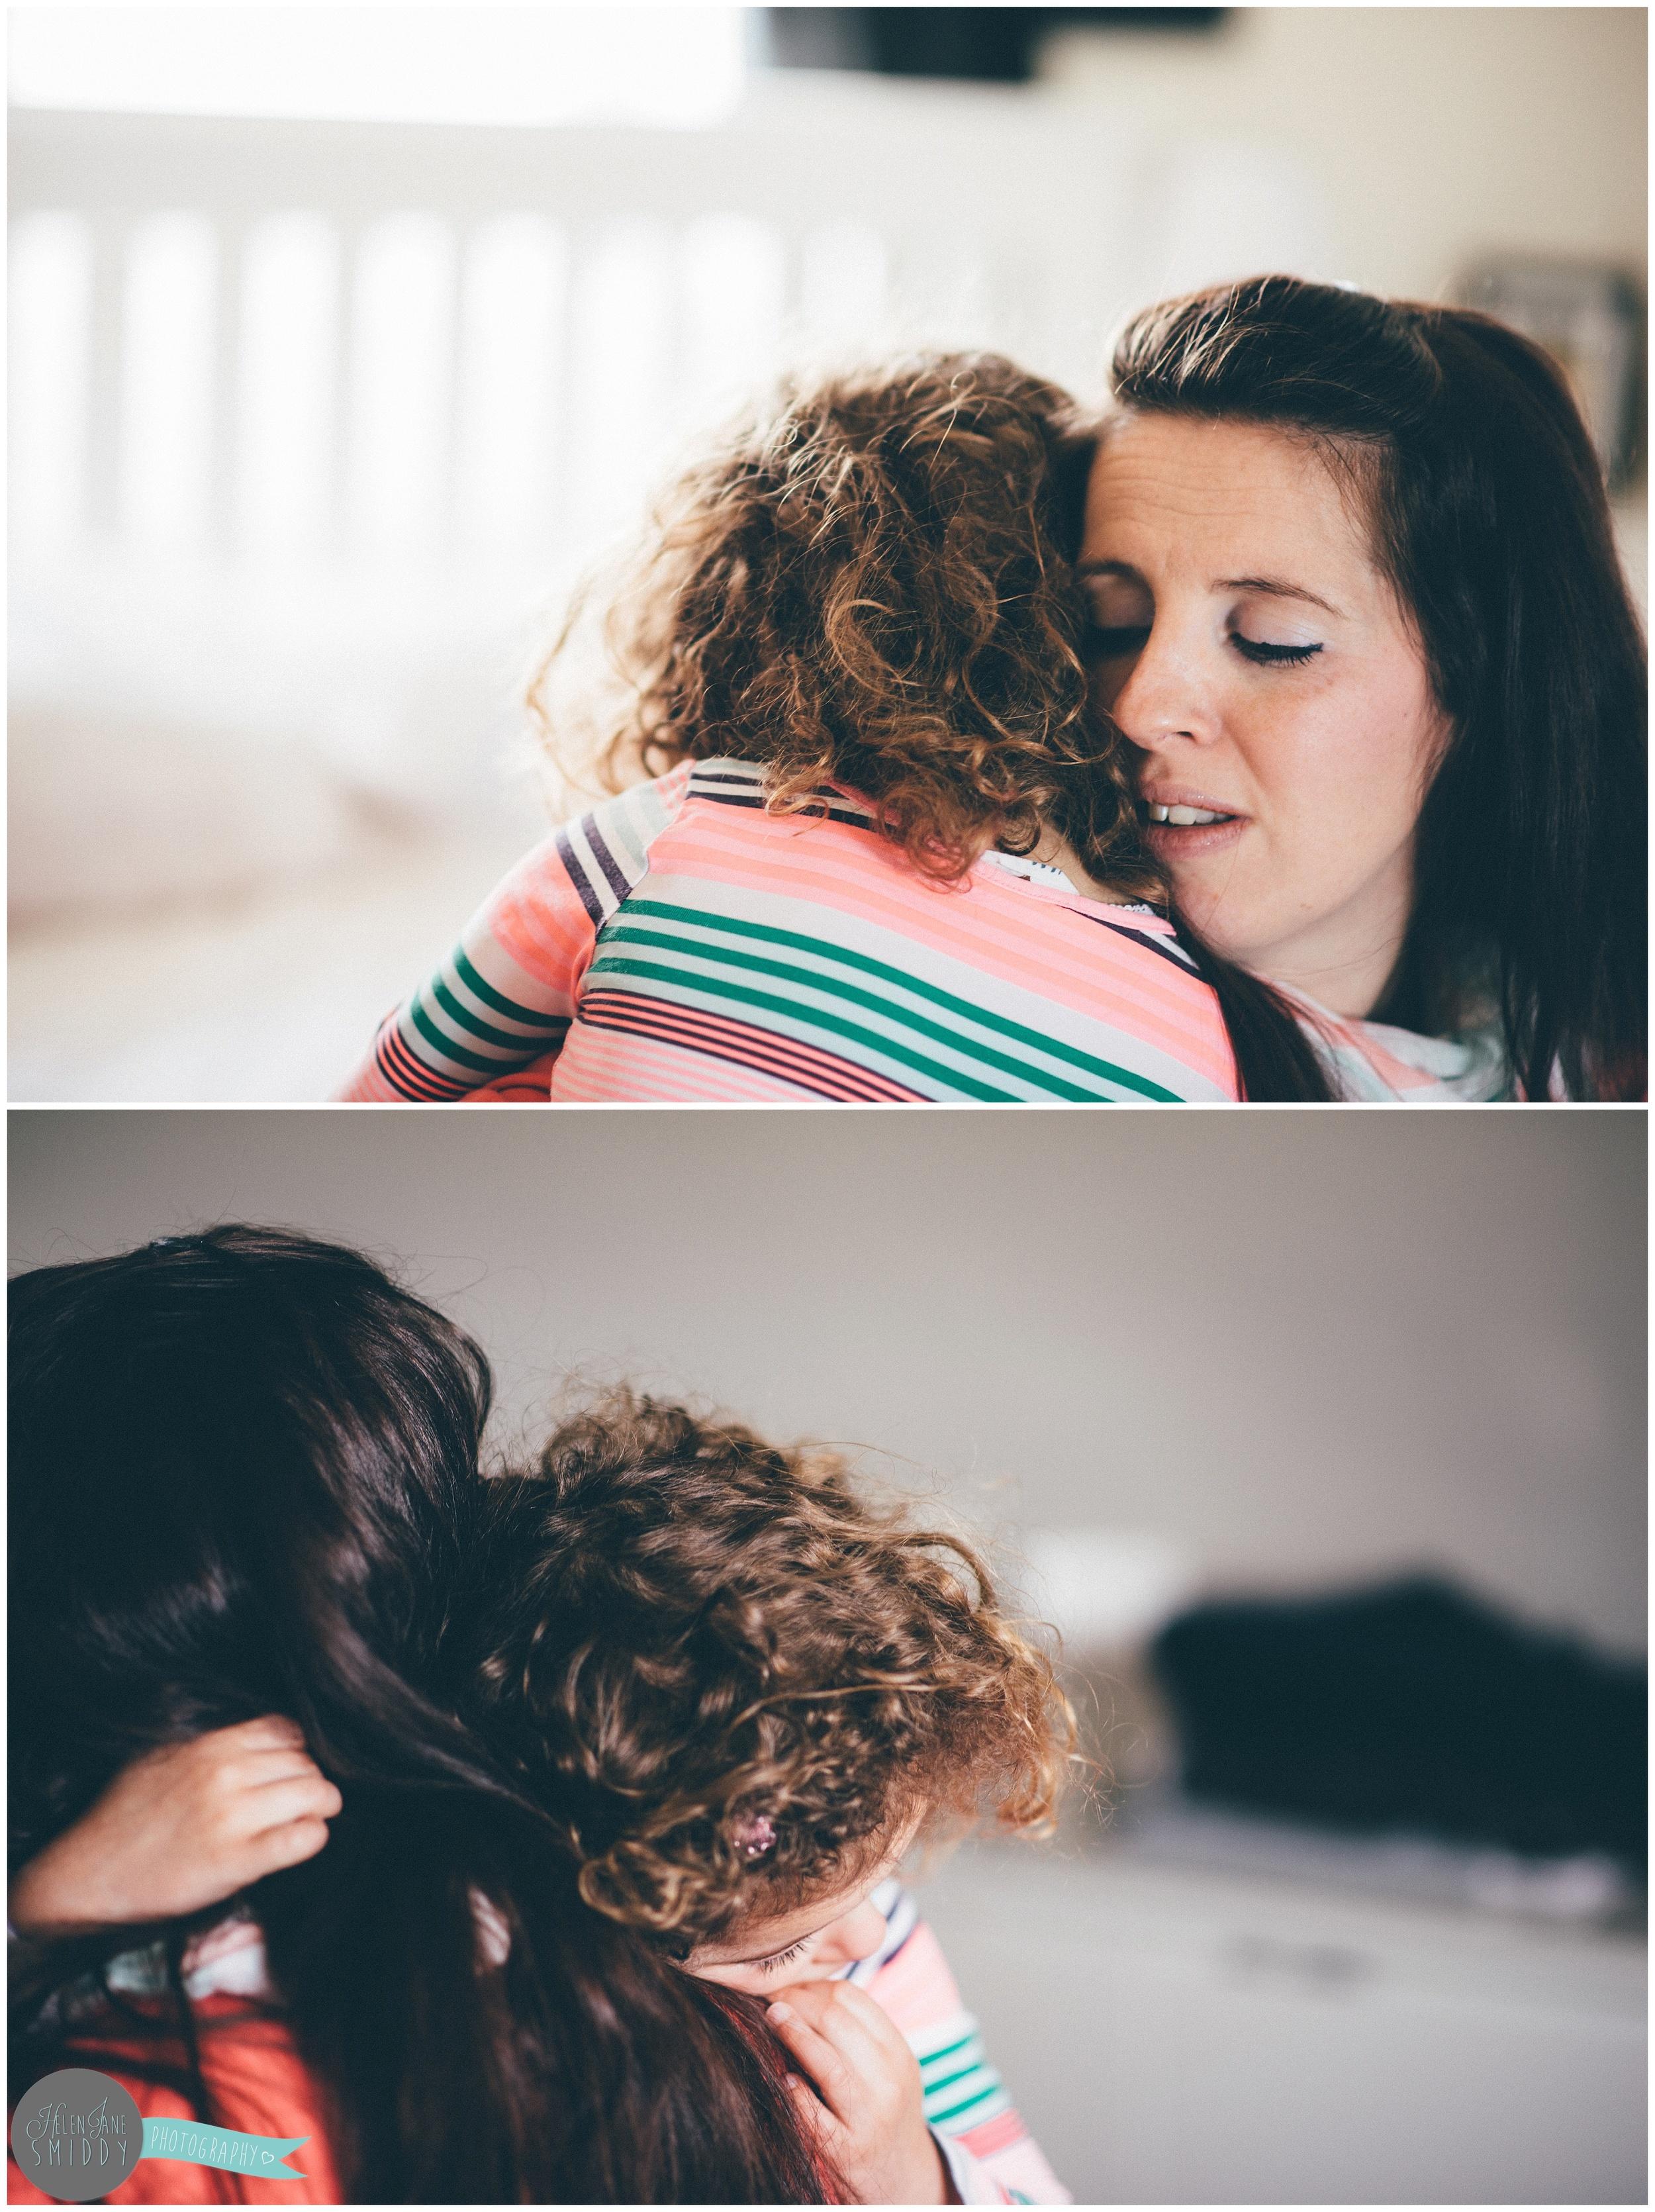 Newborn-family-photoshoot-delamere-cheshire-chester-lifestyle-photography